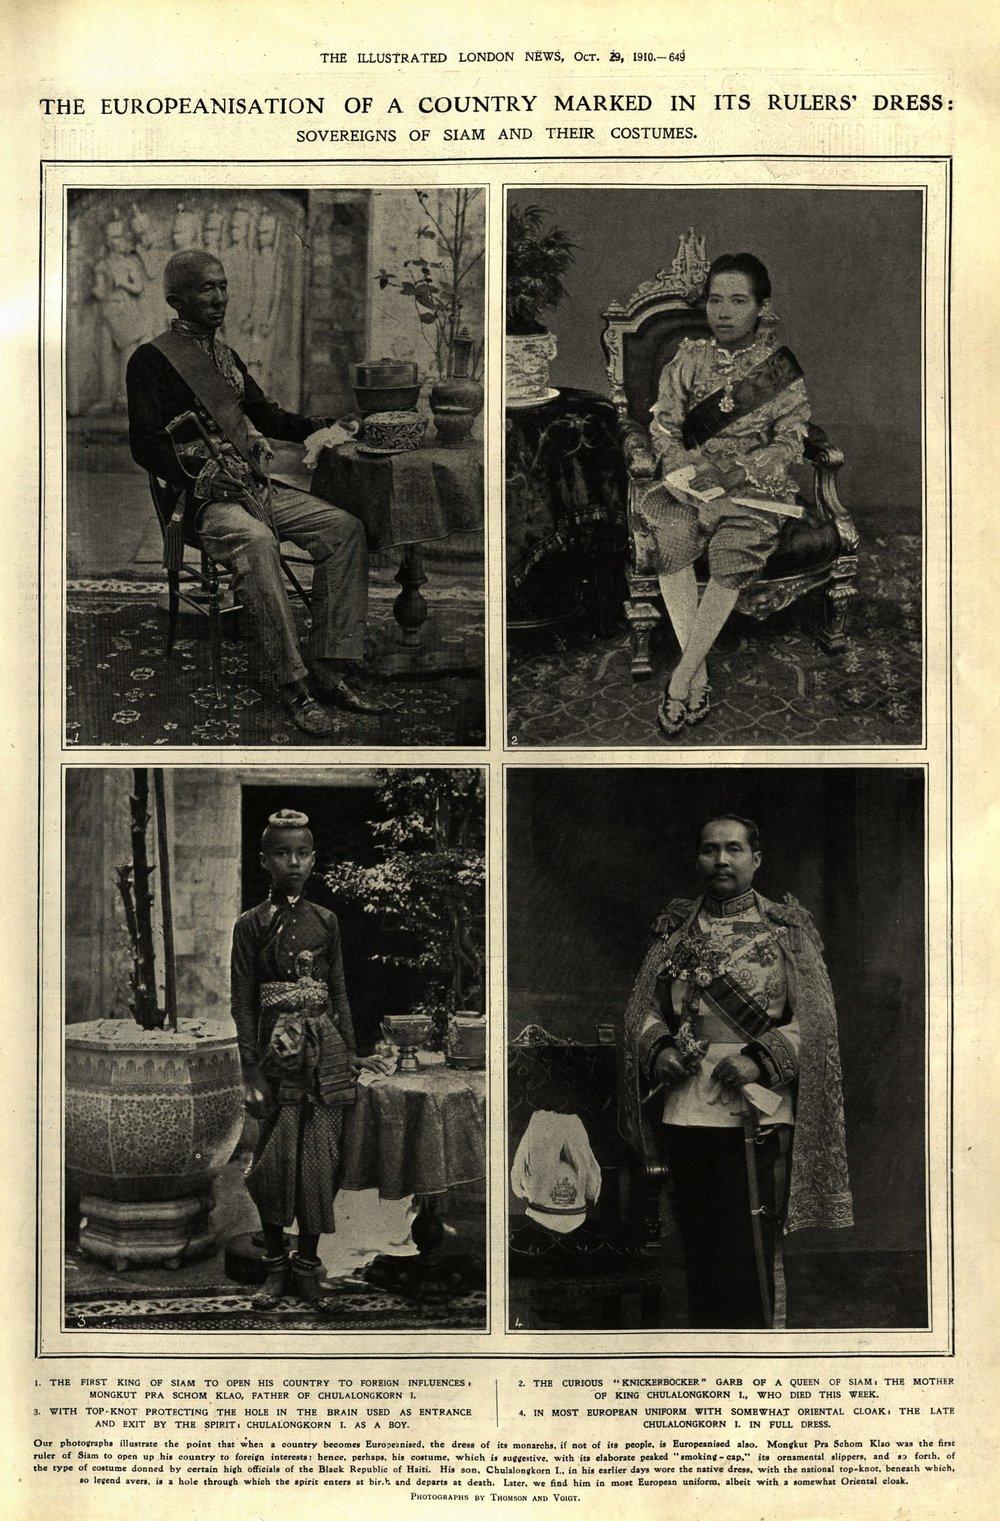 Obituary of King Chulalongkorn of Siam